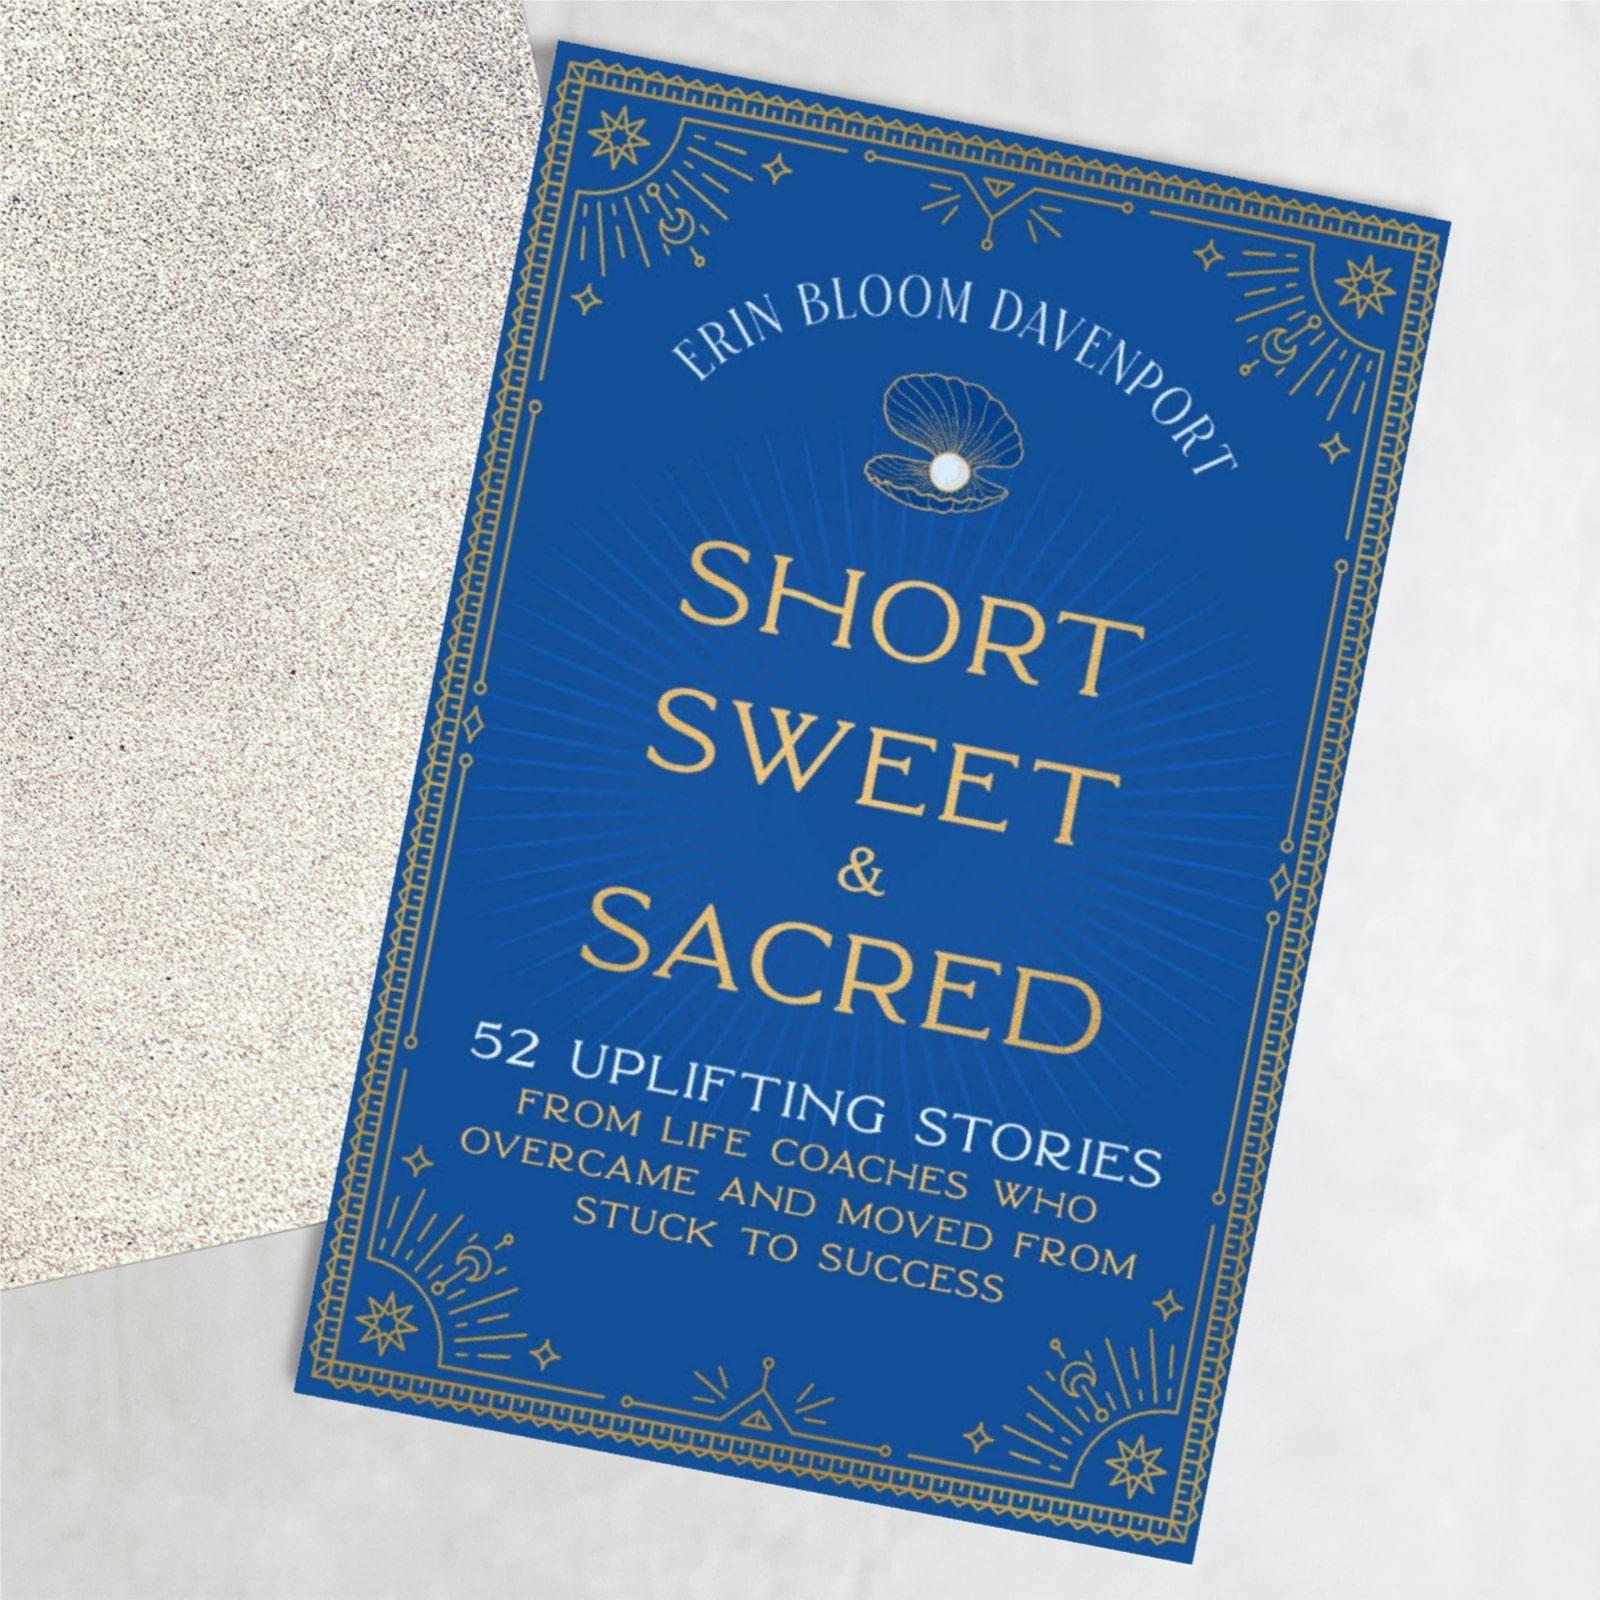 Short Sweet & Sacred